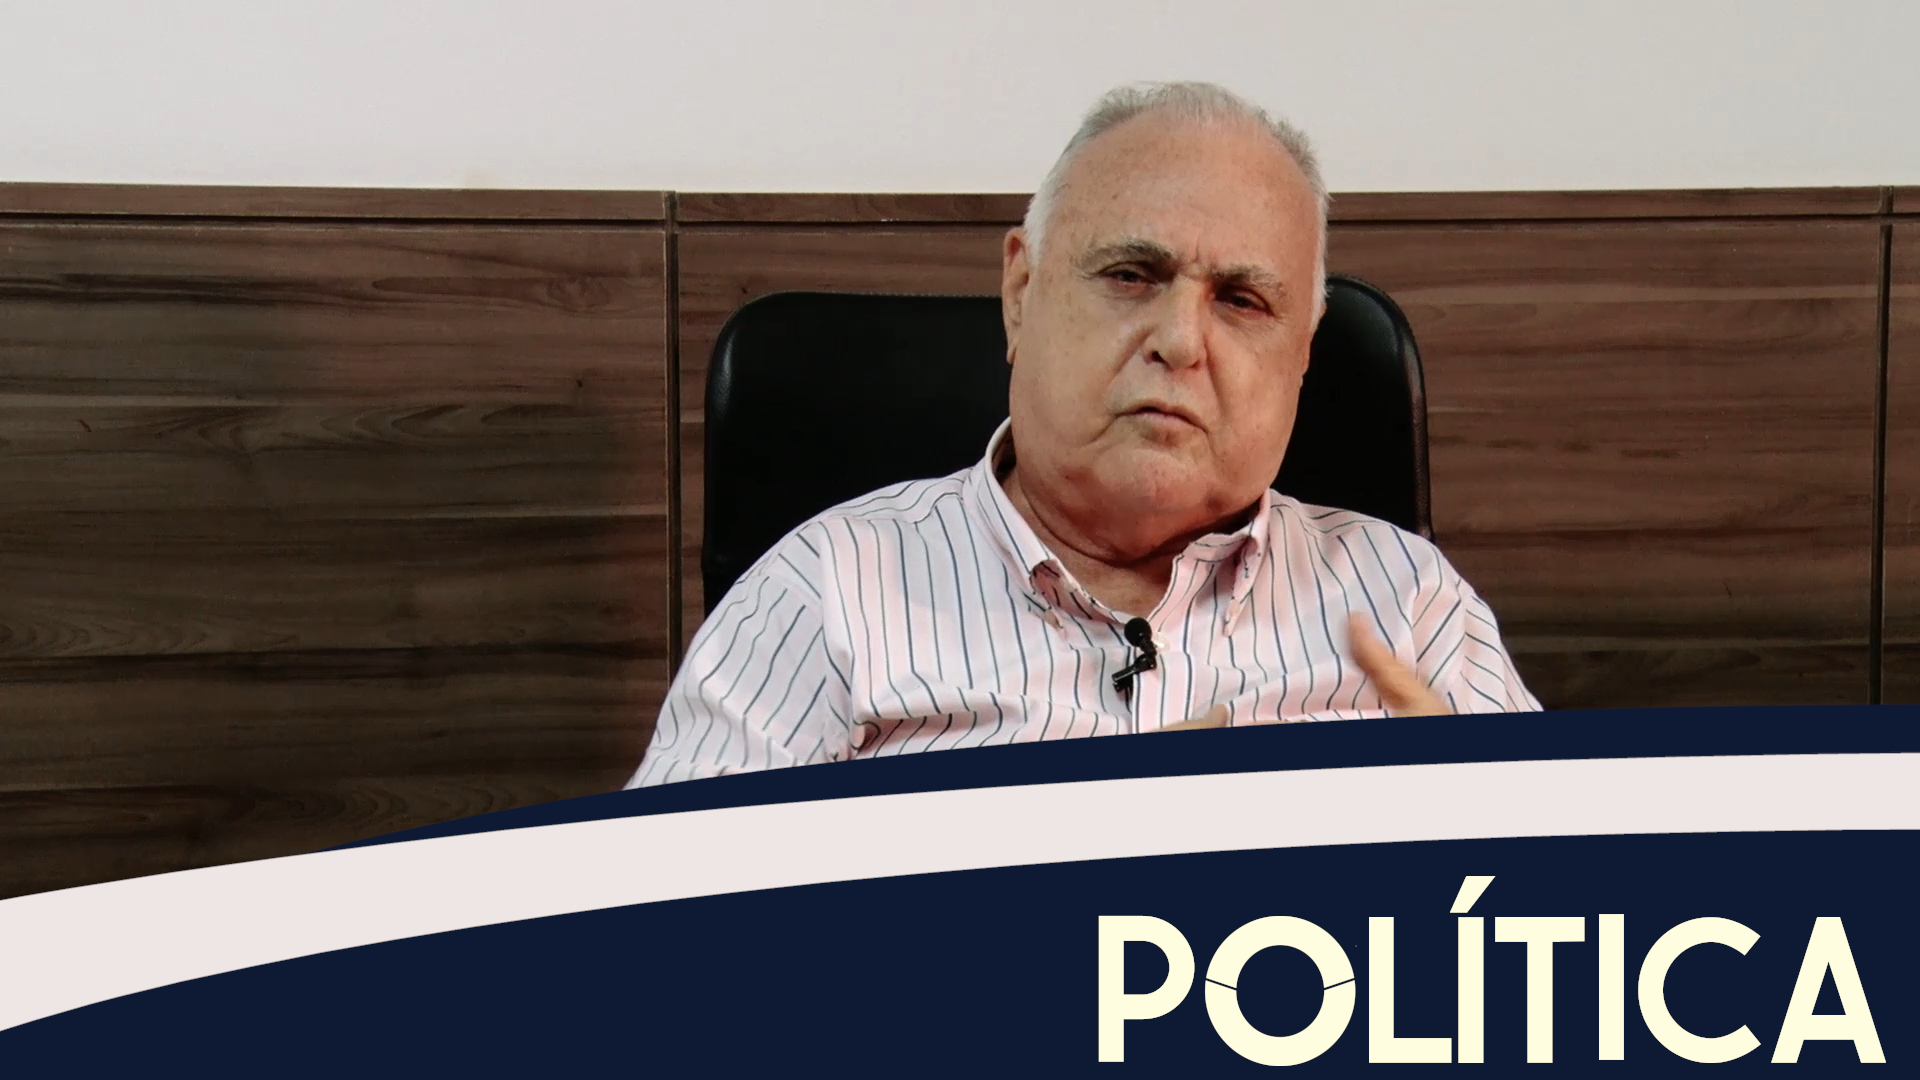 Política entrevista Prefeito de Maracanaú Roberto Pessoa